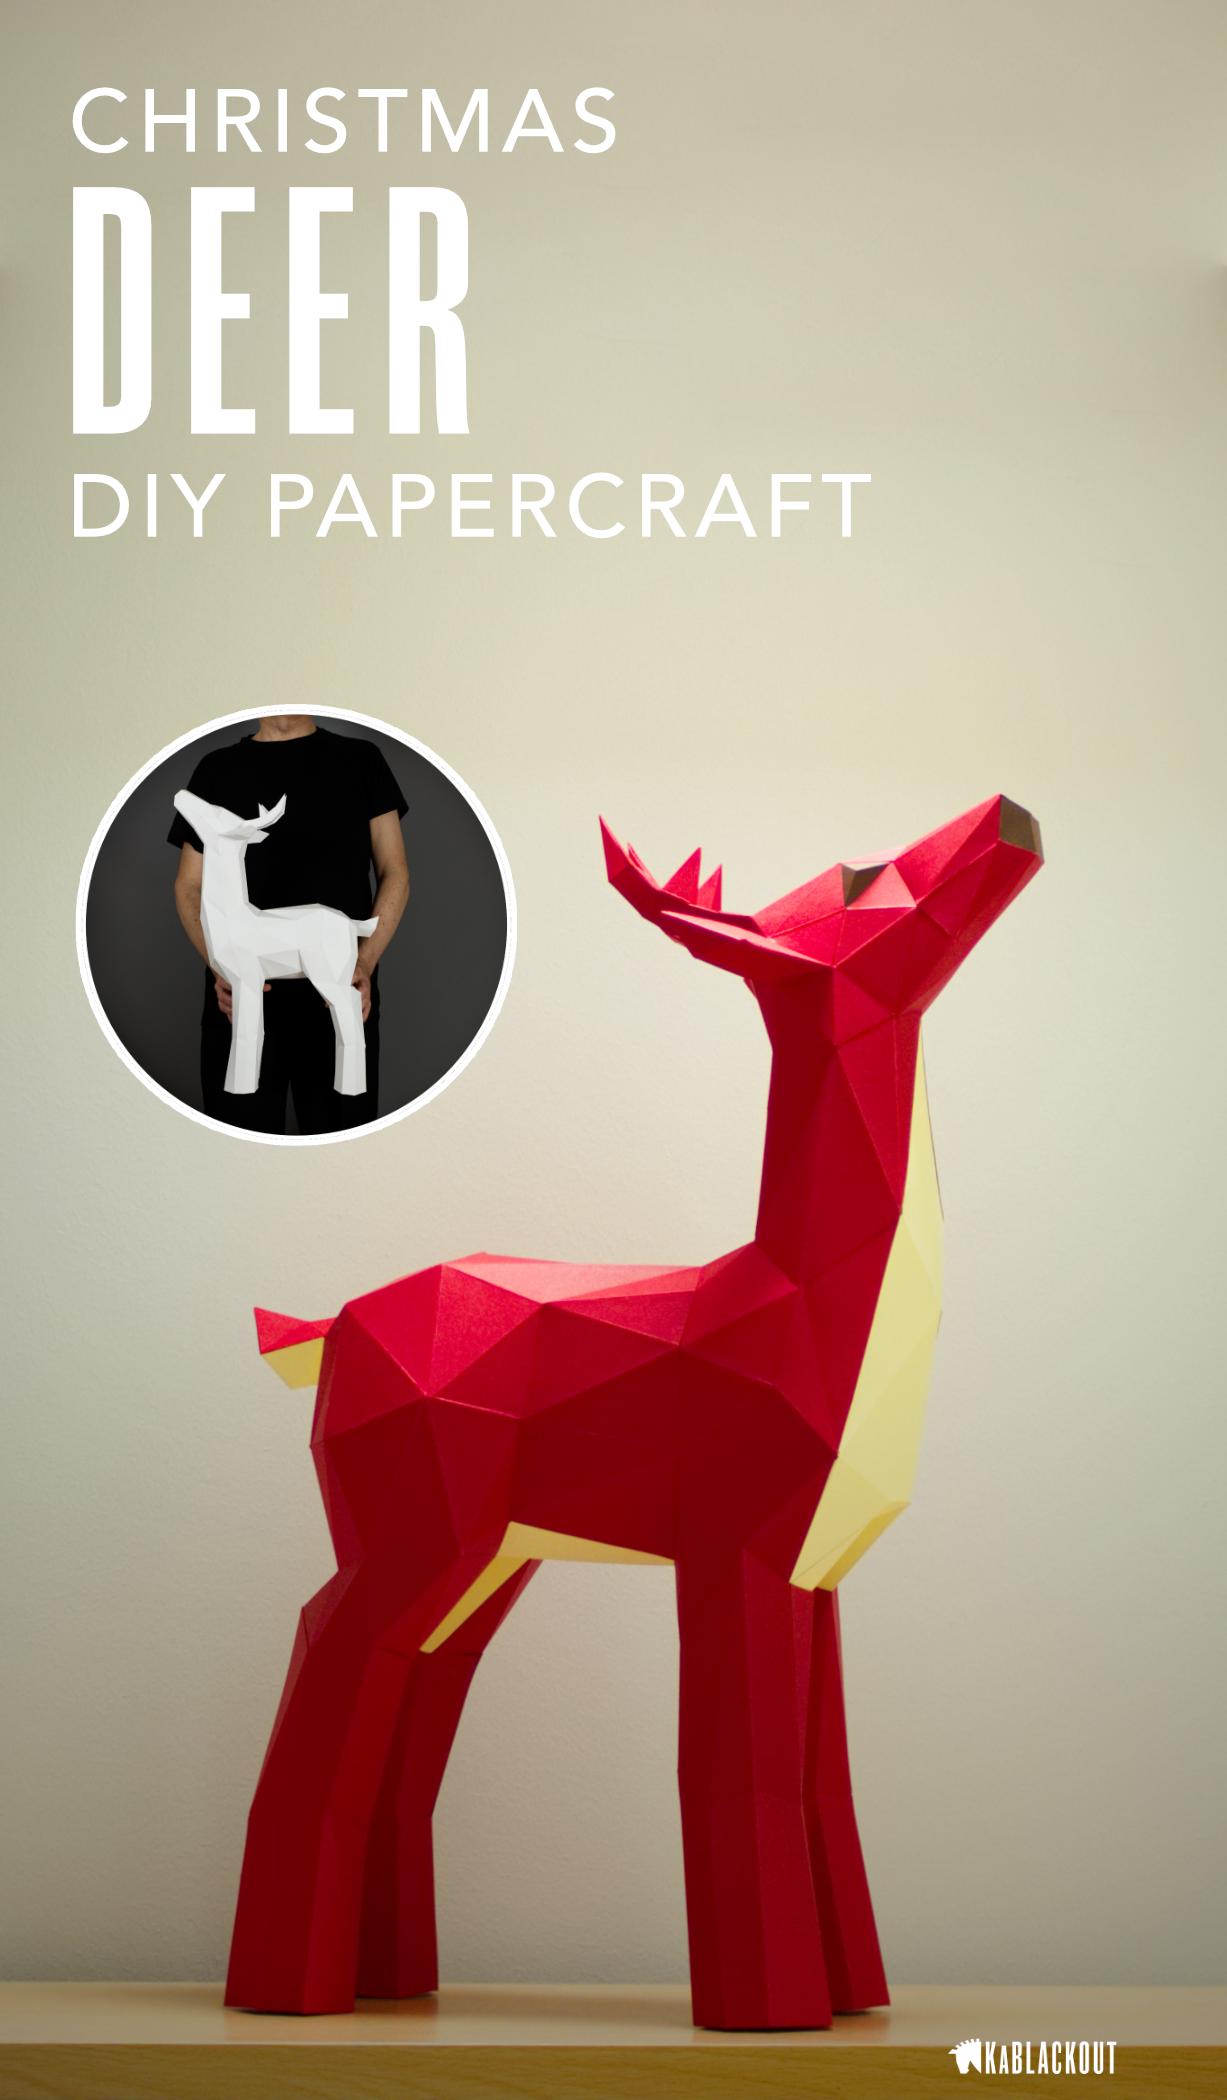 Deer Papercraft Papercraft Deer DIY Deer Low Poly Deer Deer